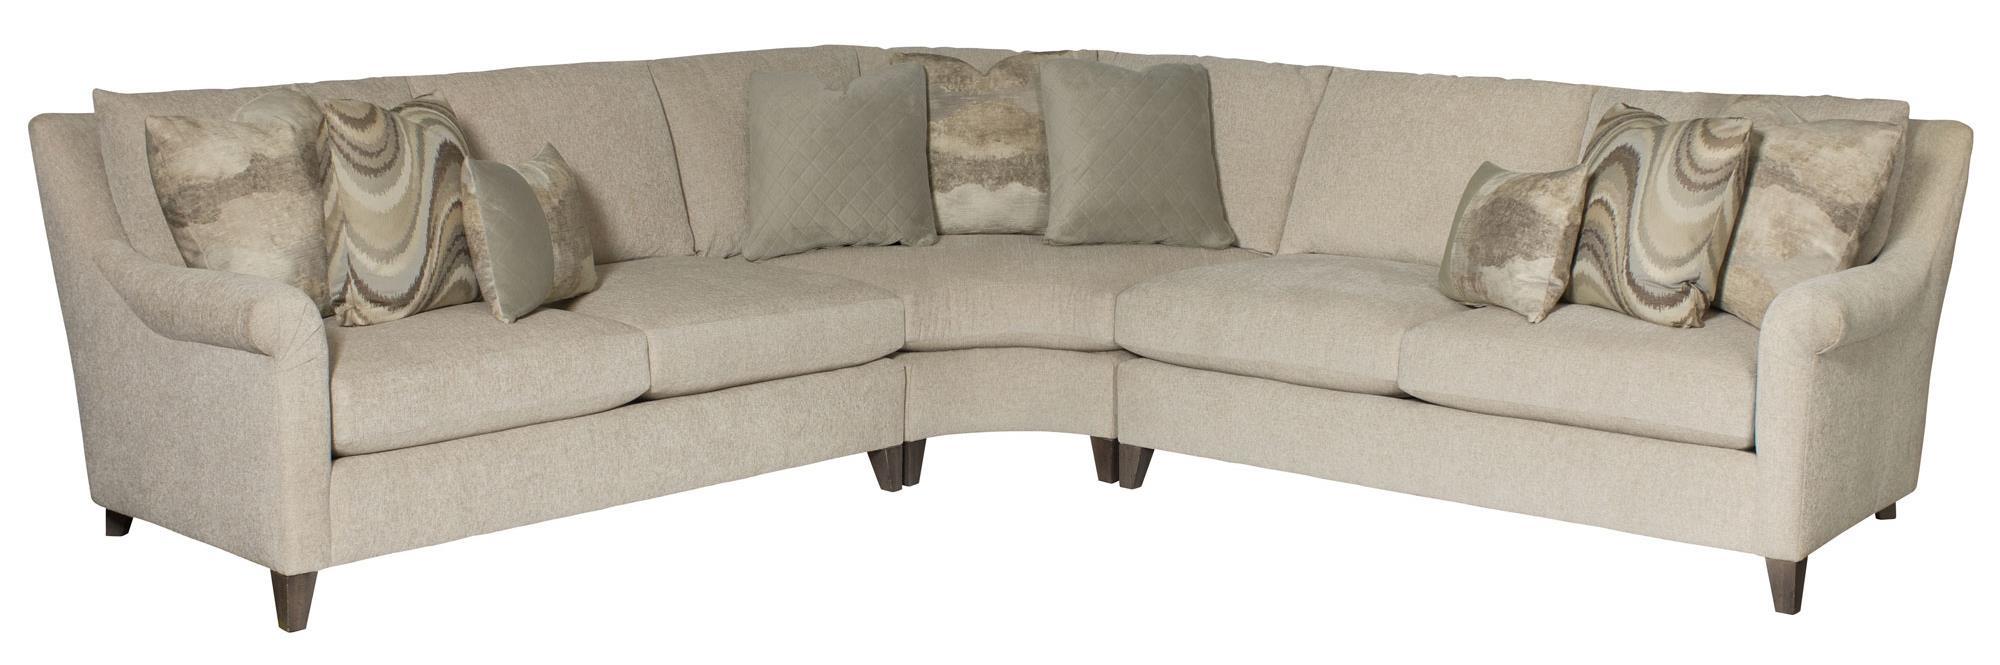 Bernhardt Sherman5 Seat Sectional Sofa ...